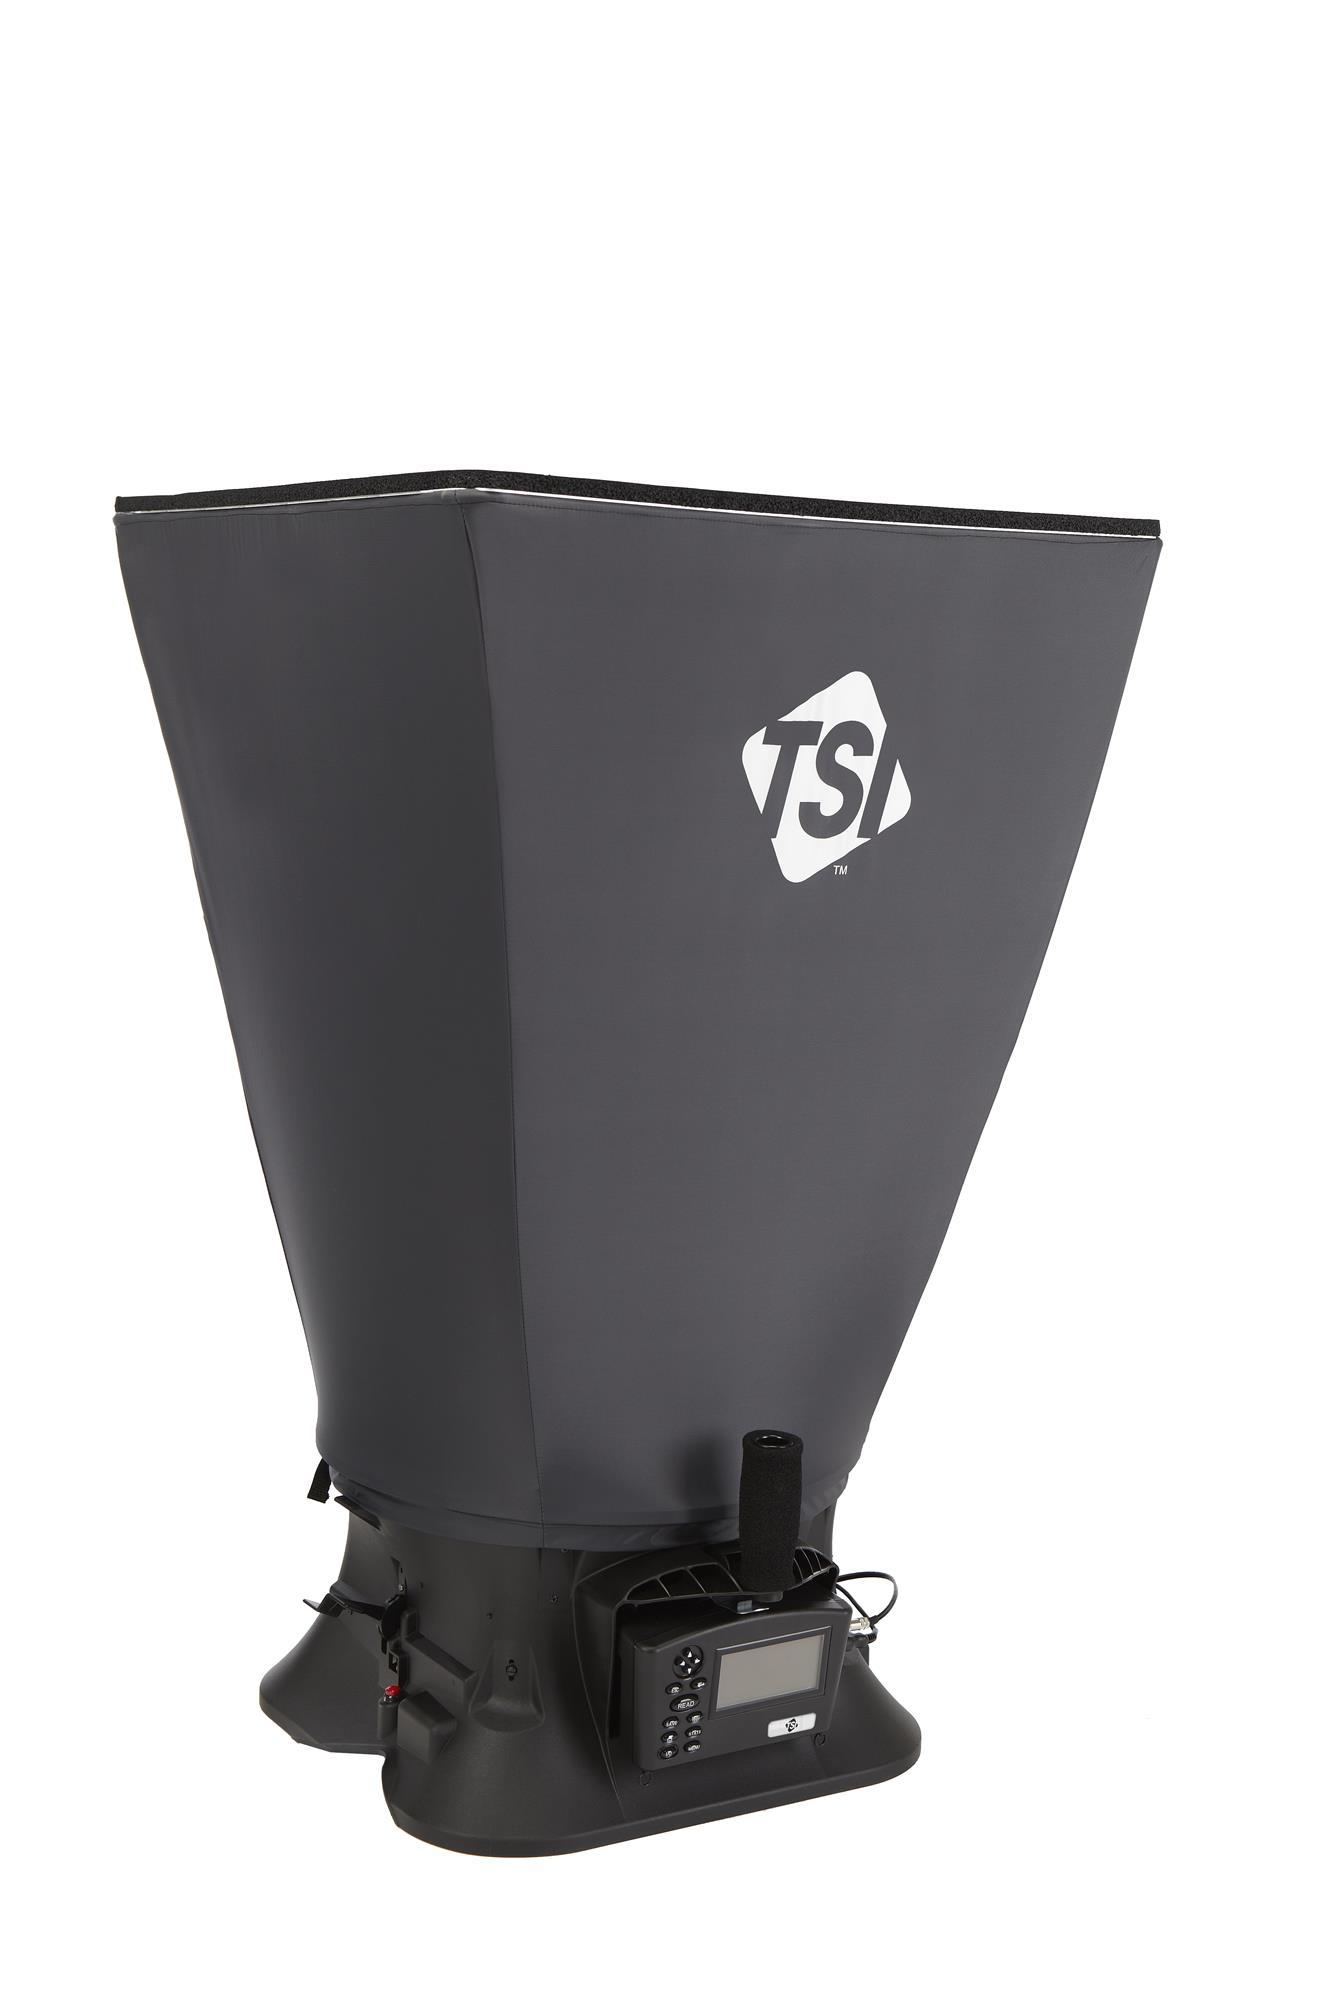 Tsi美国特赛-ACCUBALANCE 8380 数字式风量罩